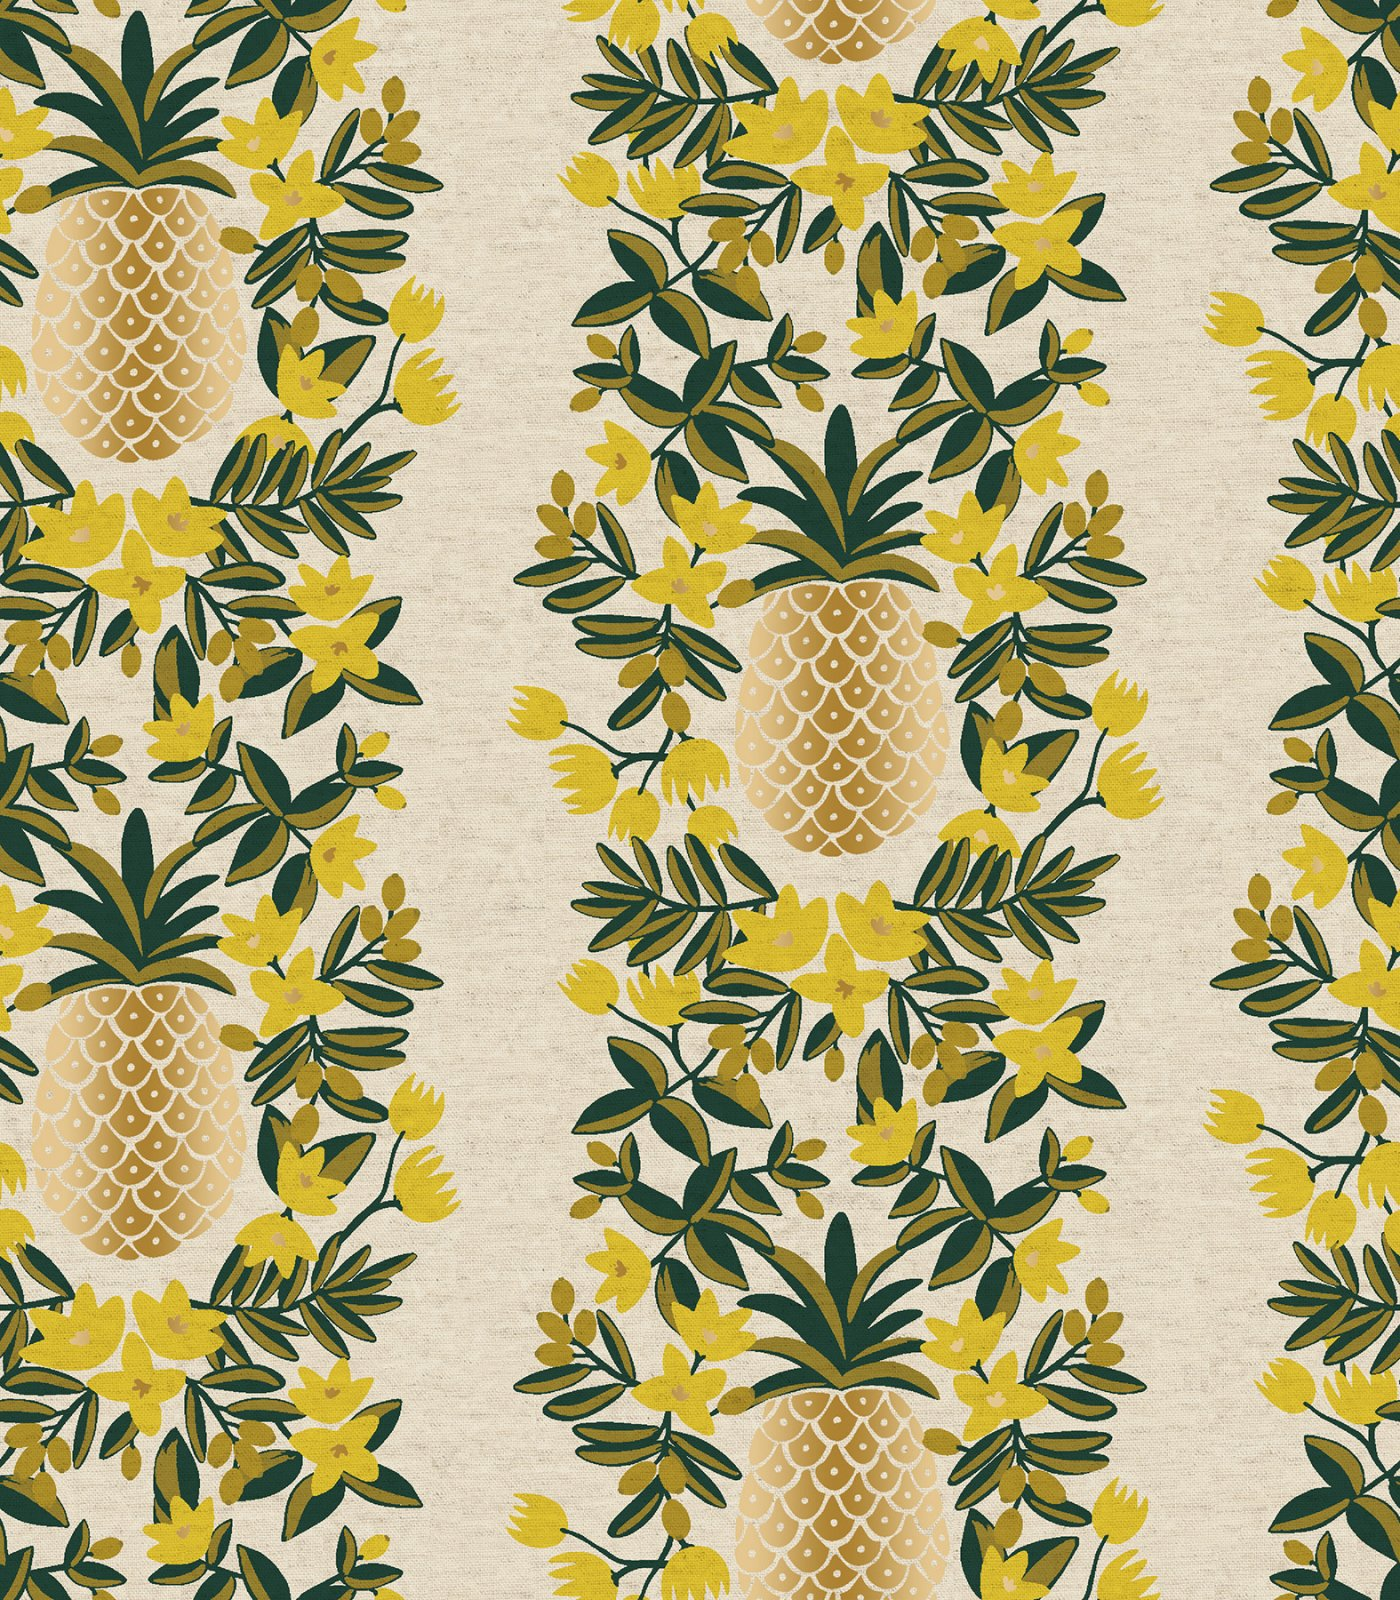 Rifle Paper Co. Primavera Pineapple Stripe (Cream Canvas Metallic)